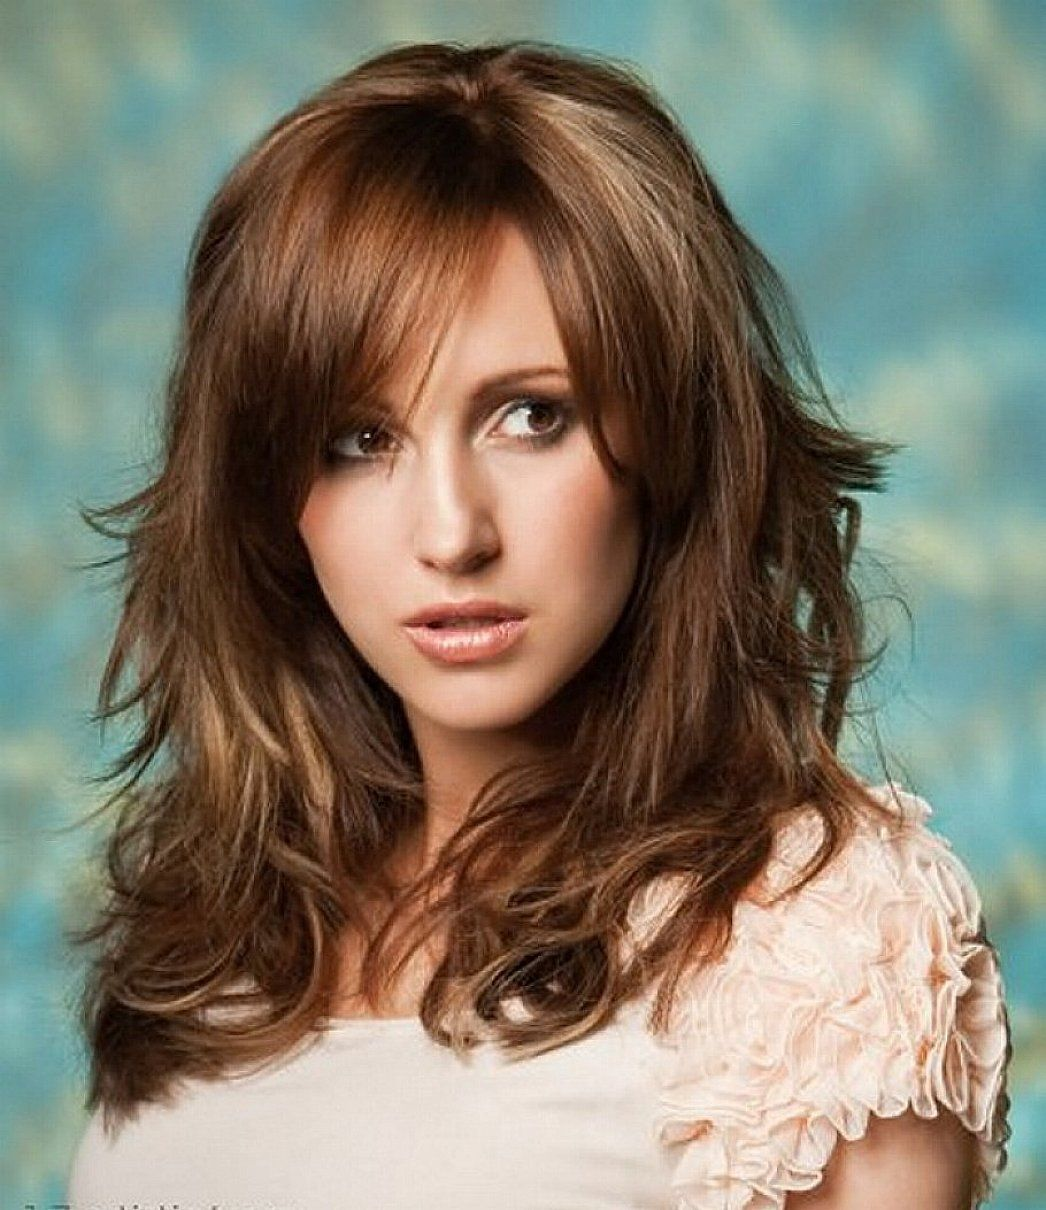 Cute Haircuts For Long Wavy Hair Photo 1 Medium Length Hair Styles Bangs With Medium Hair Medium Length Hair With Layers